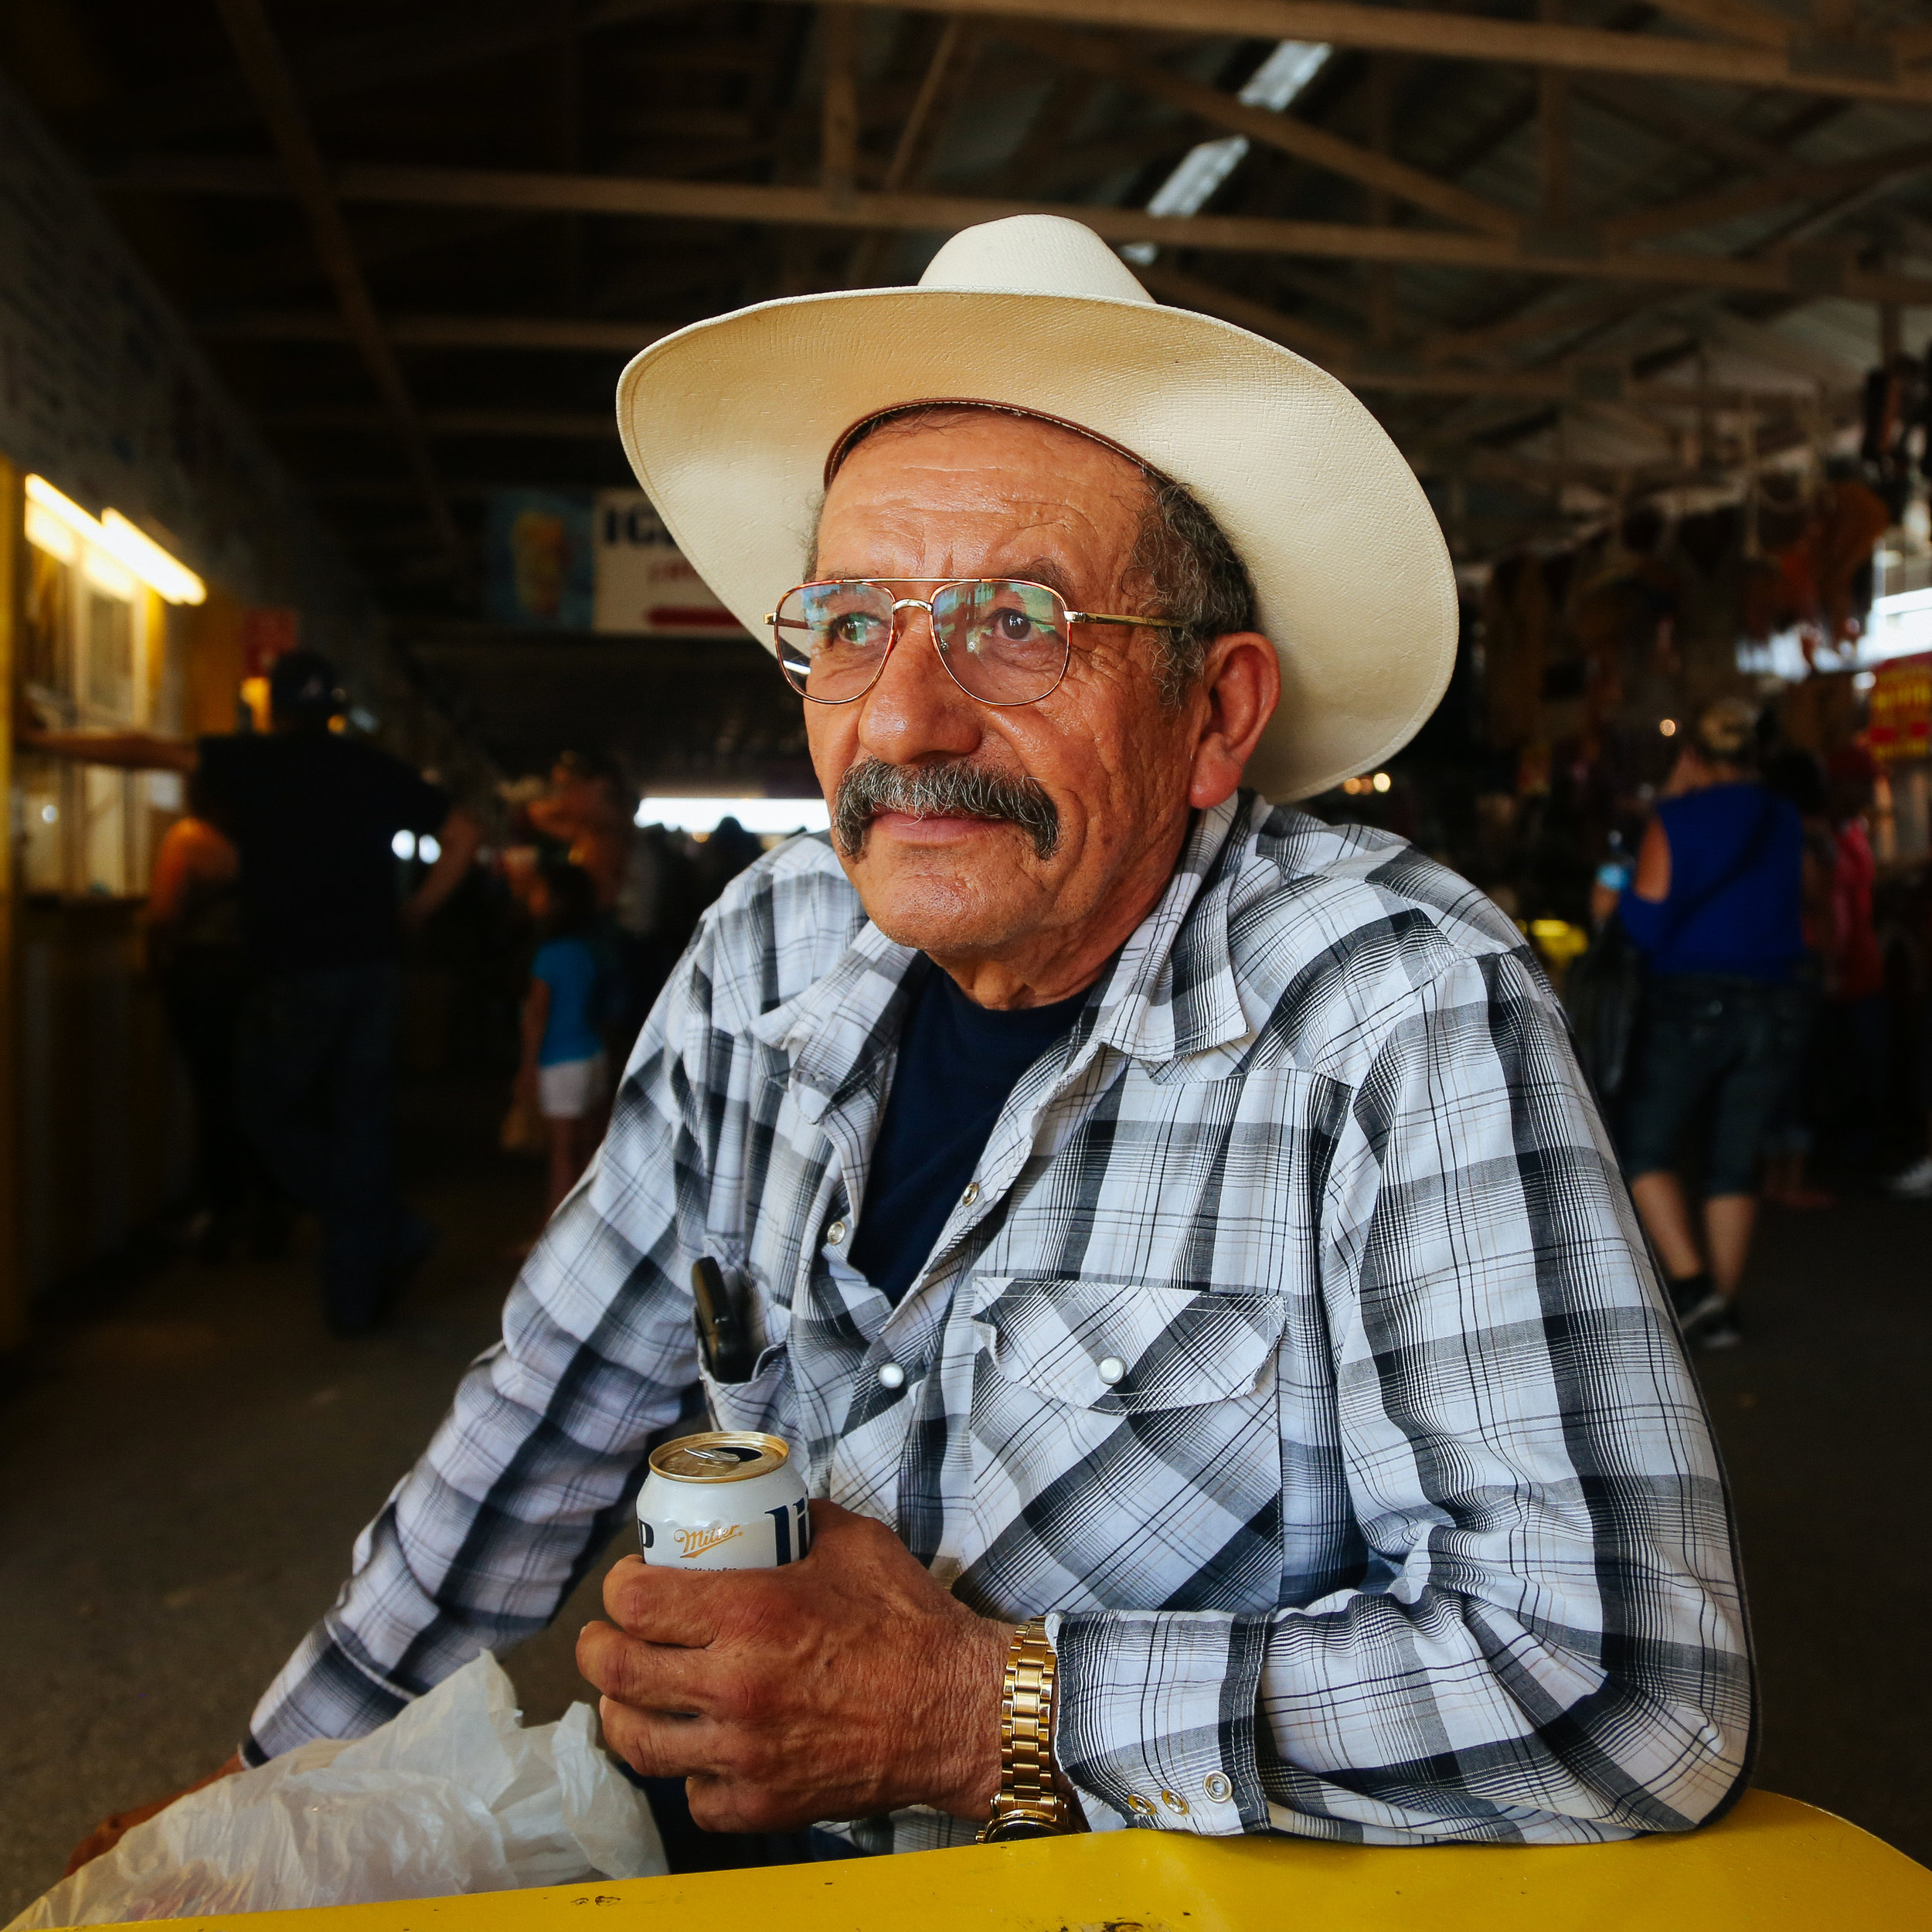 Man with his Miller Lite, San Antonio, Texas 2015